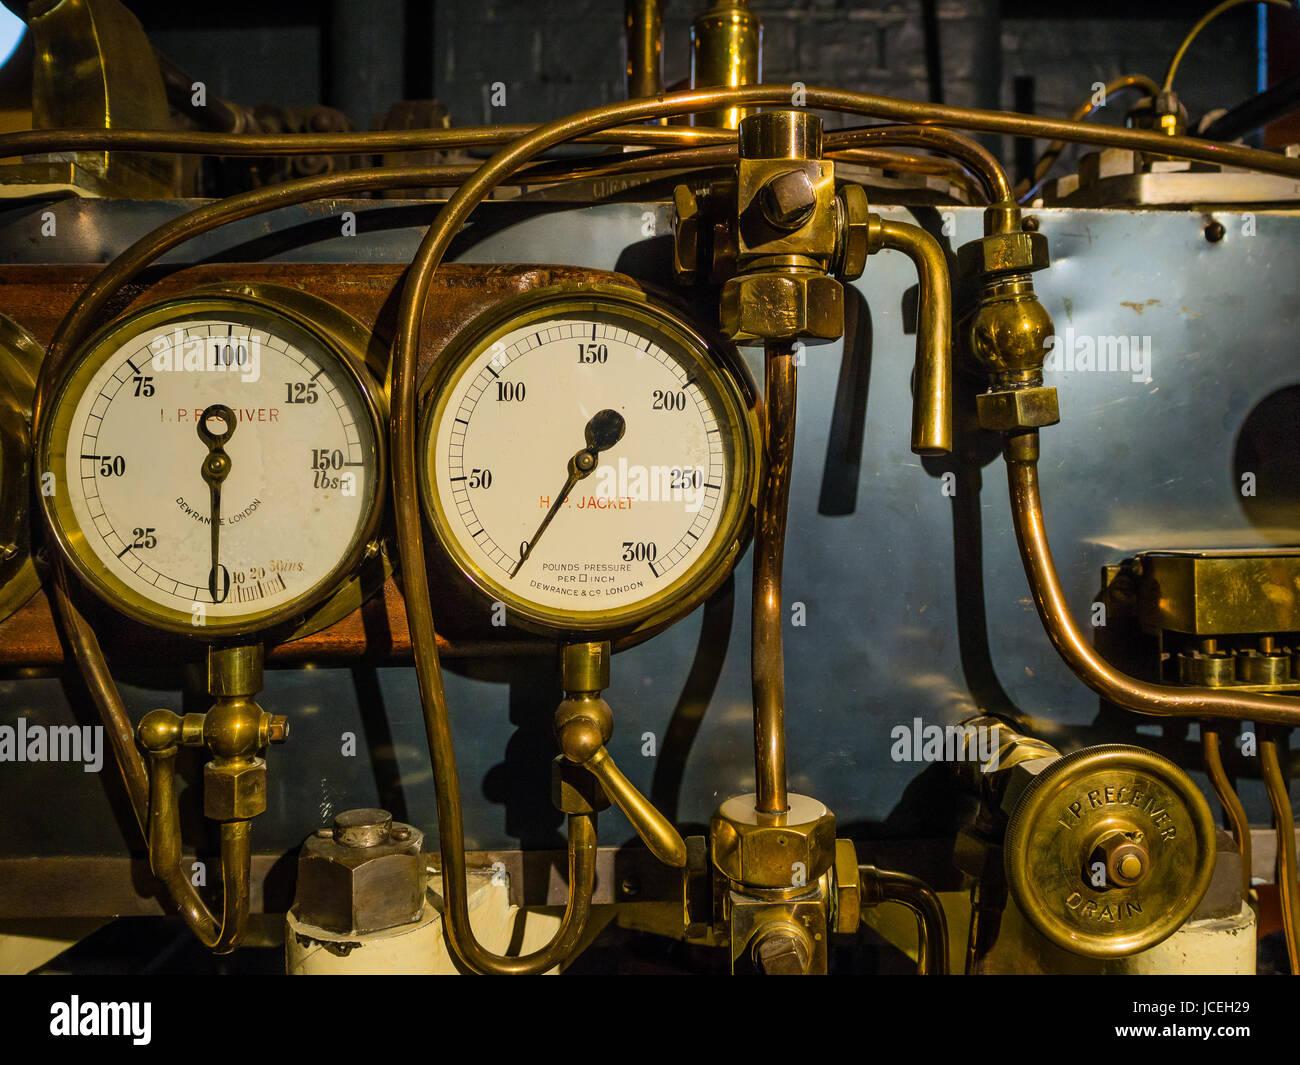 Engineering pressure dials - Stock Image